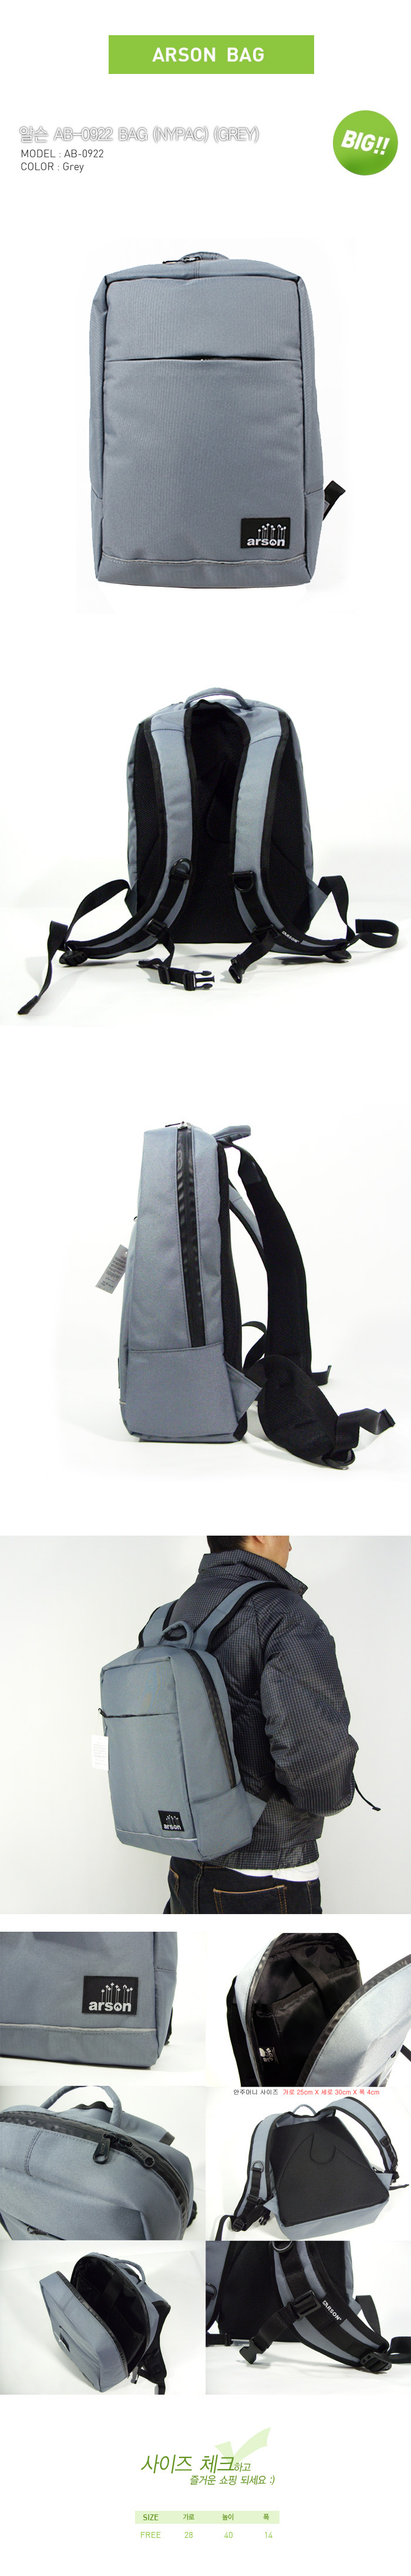 [ ARSON ] AB-0922 Nypac(灰色)背包书包